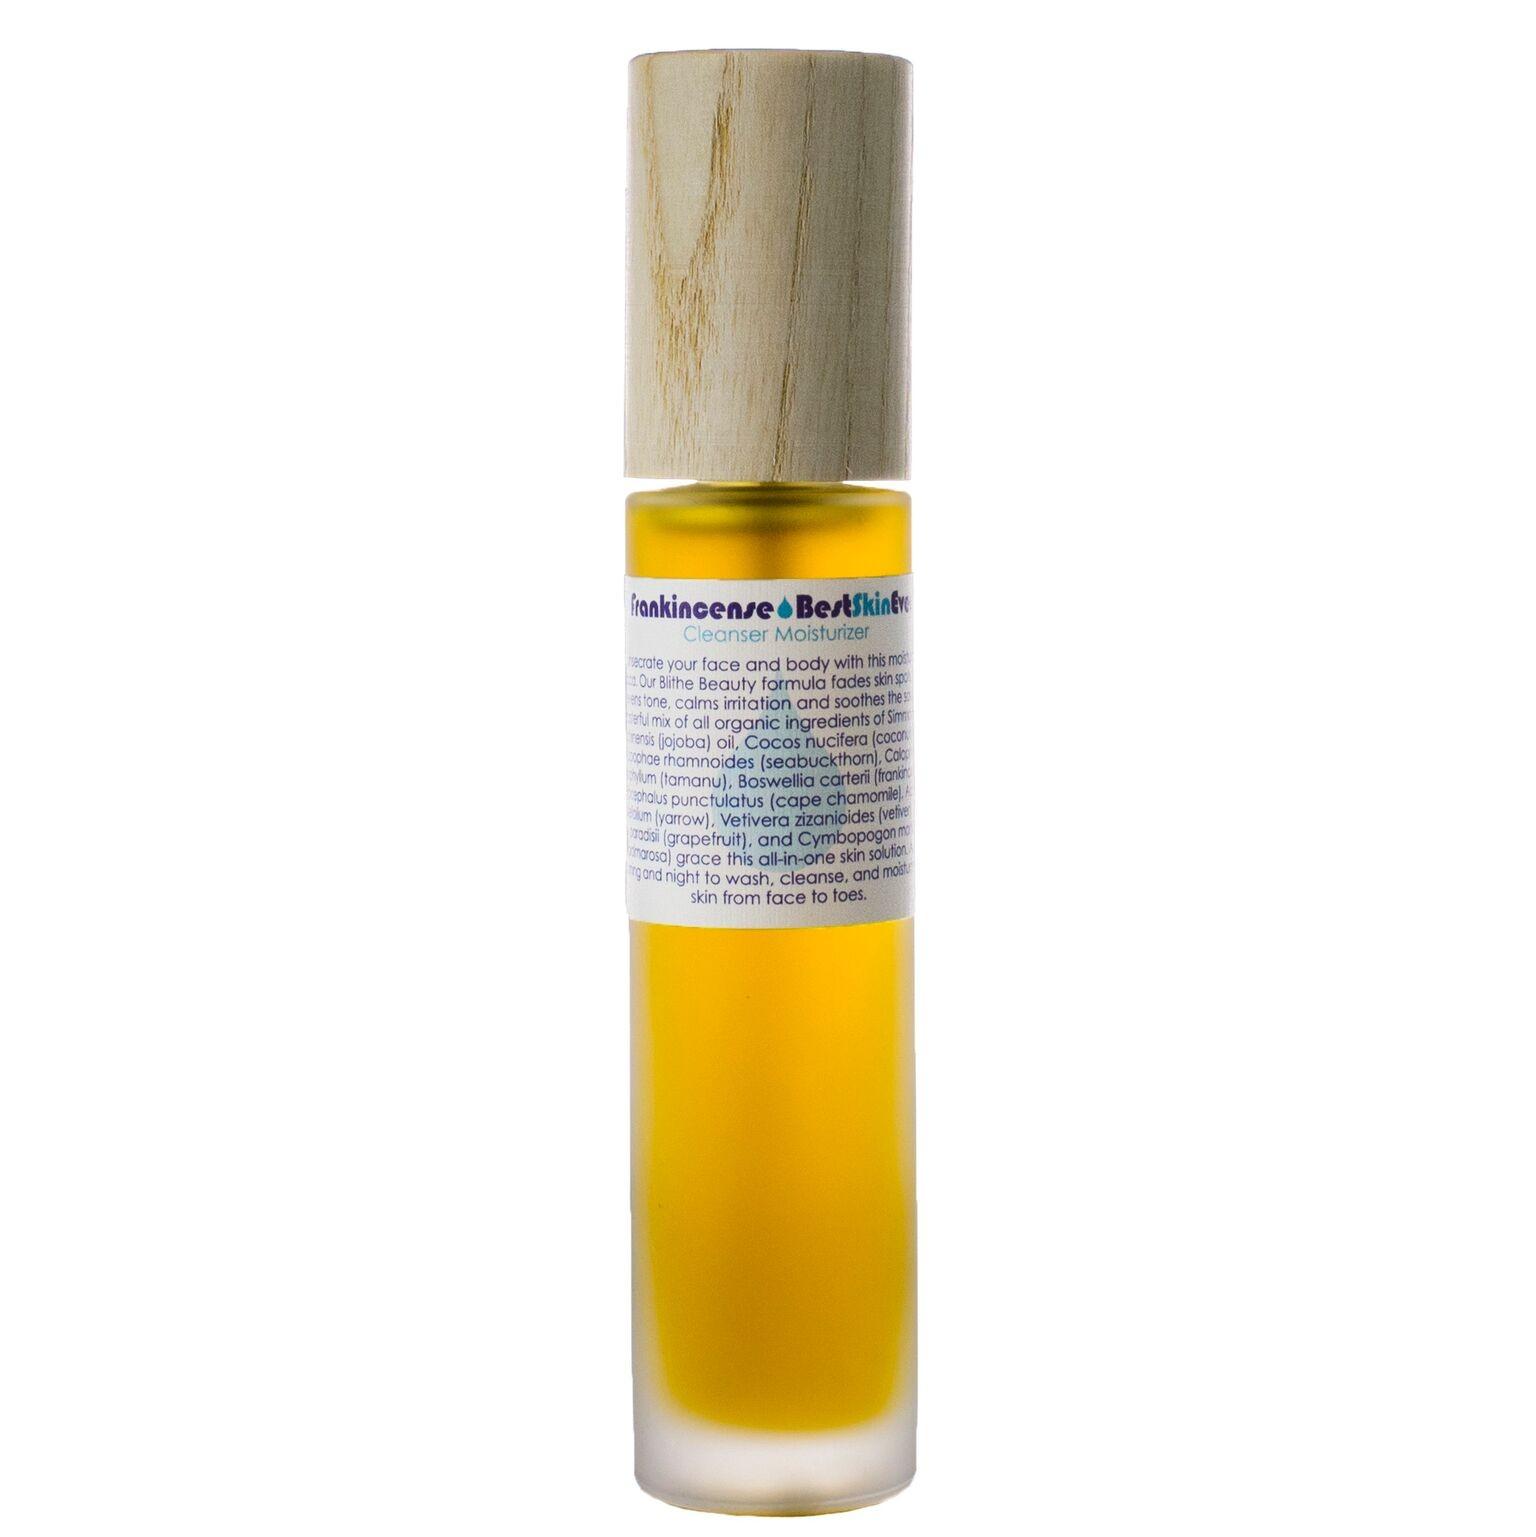 Living Libations Best Skin Ever in Frankincense